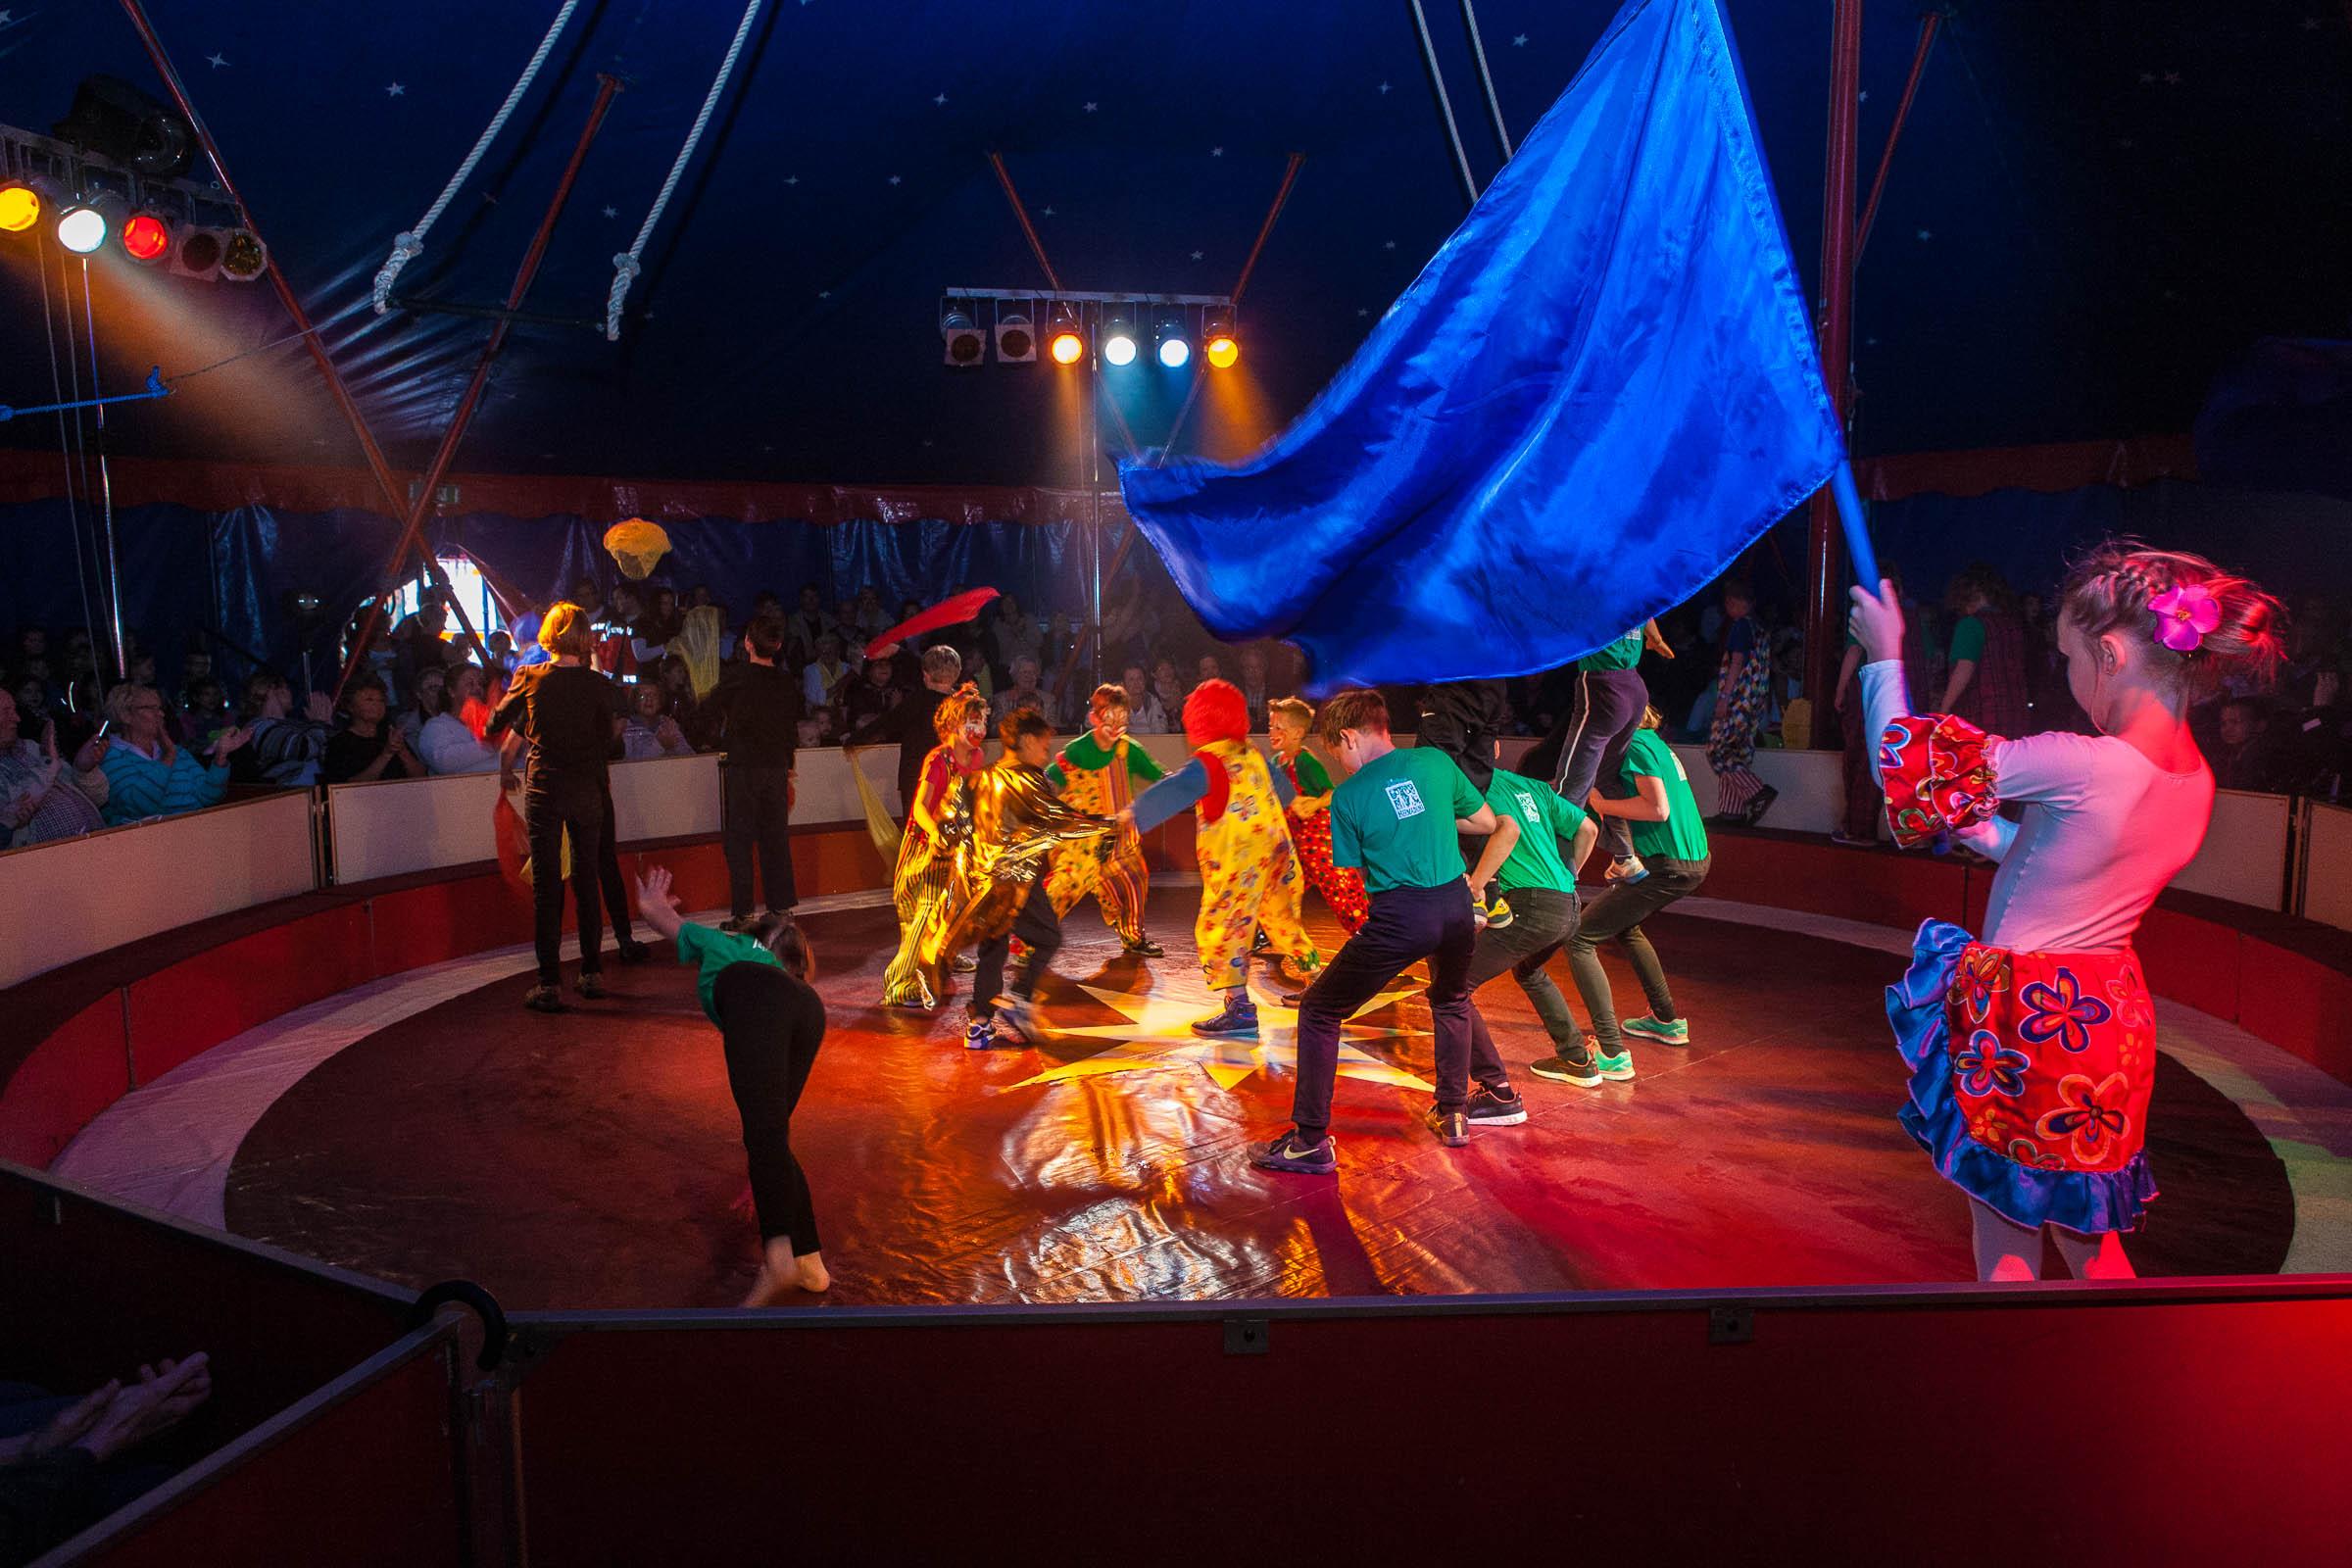 20150619_KitaLummerland@CircusBernadini_003.jpg